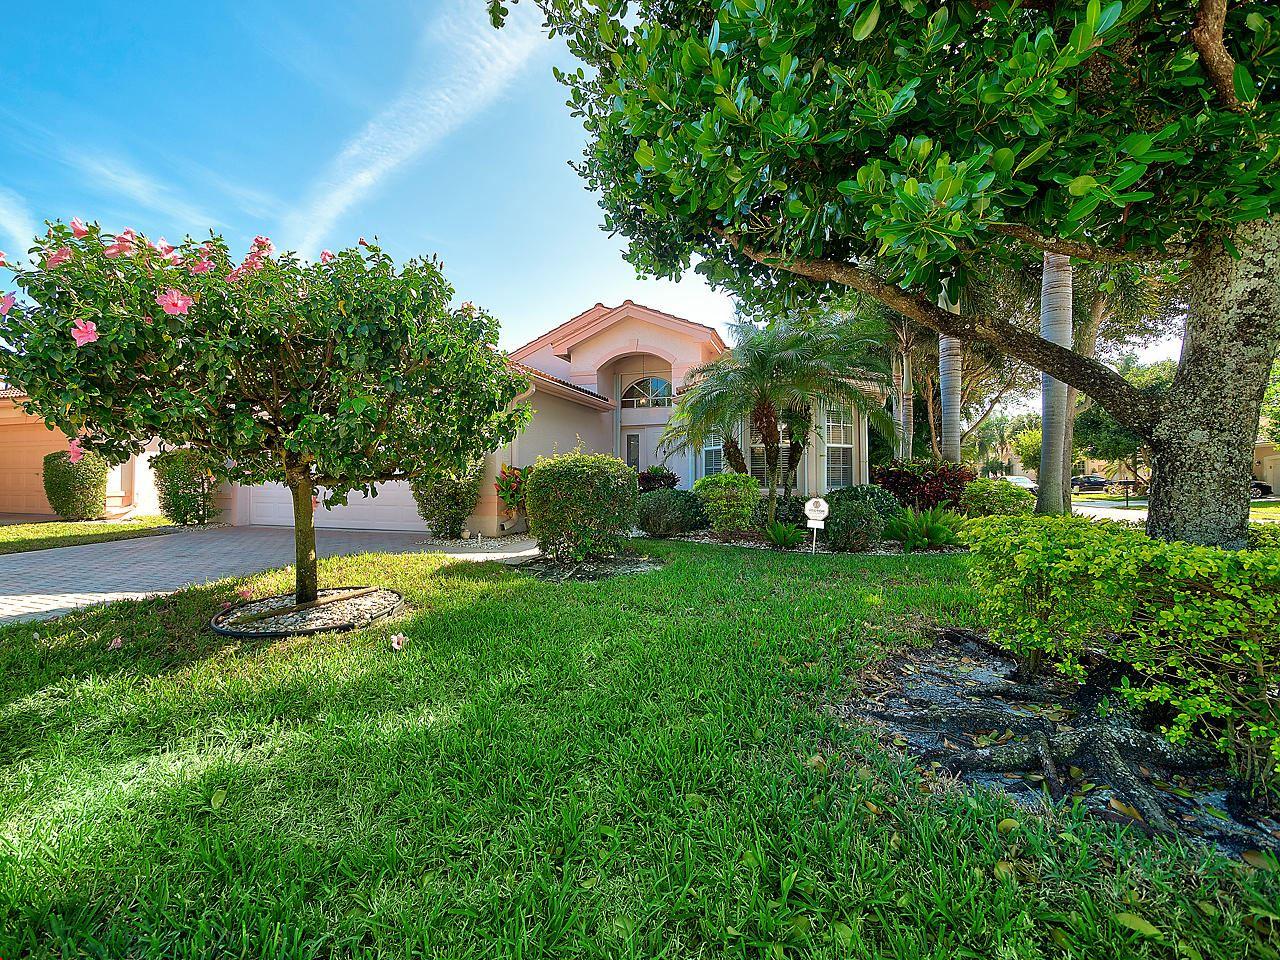 7442 Kea Lani Drive, Boynton Beach, FL 33437 - MLS#: RX-10731659